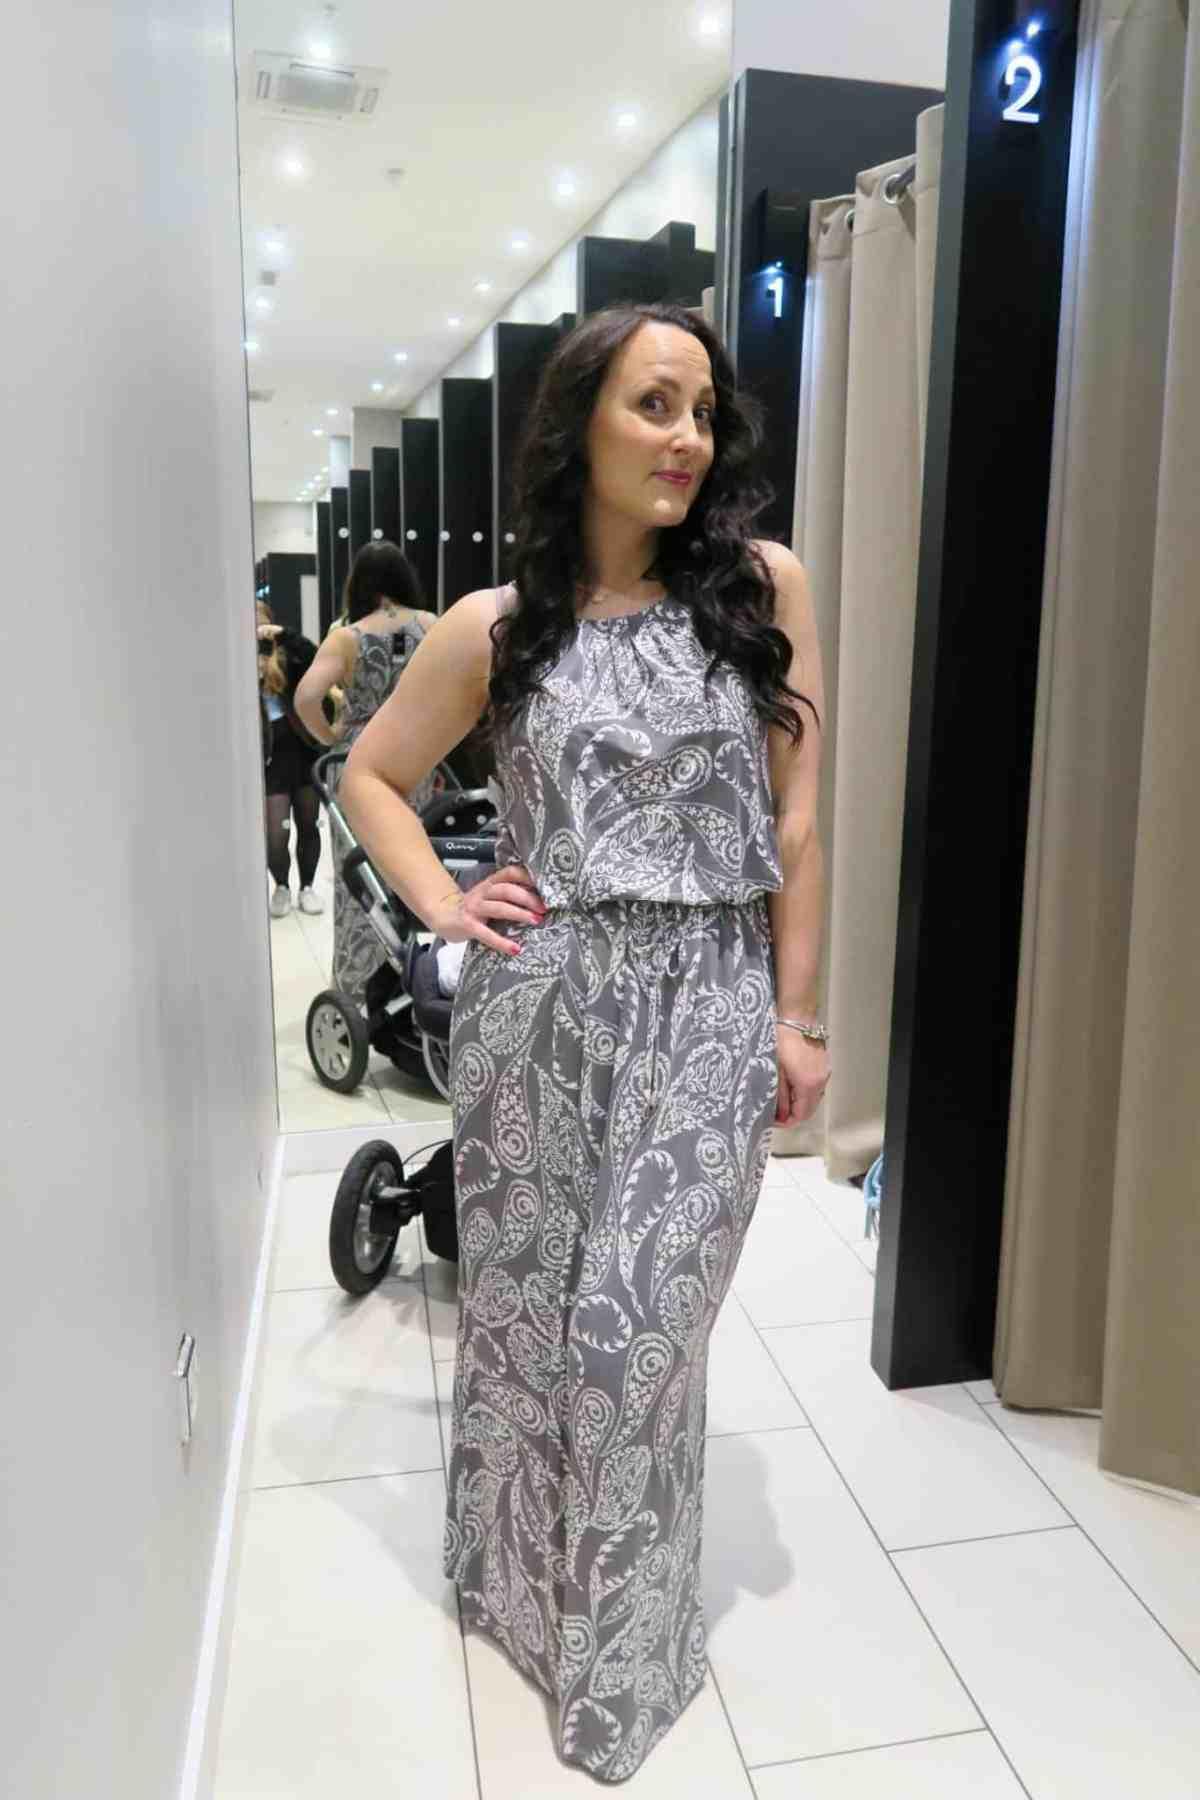 Long maxi dress from next